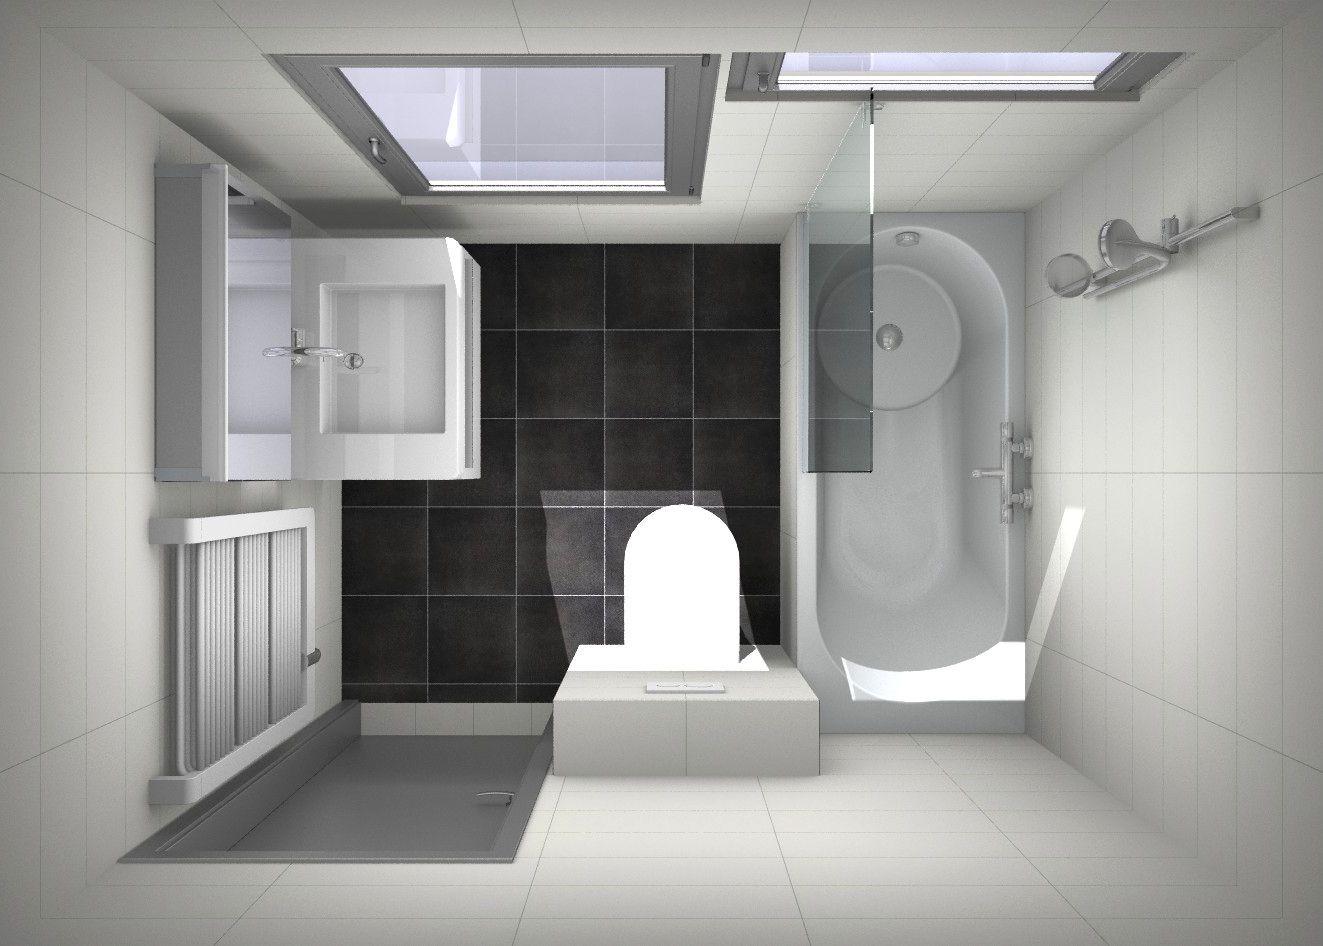 Voorbeeld ontwerp douchen in bad, kleine #badkamer | Küçük Banyolar ...